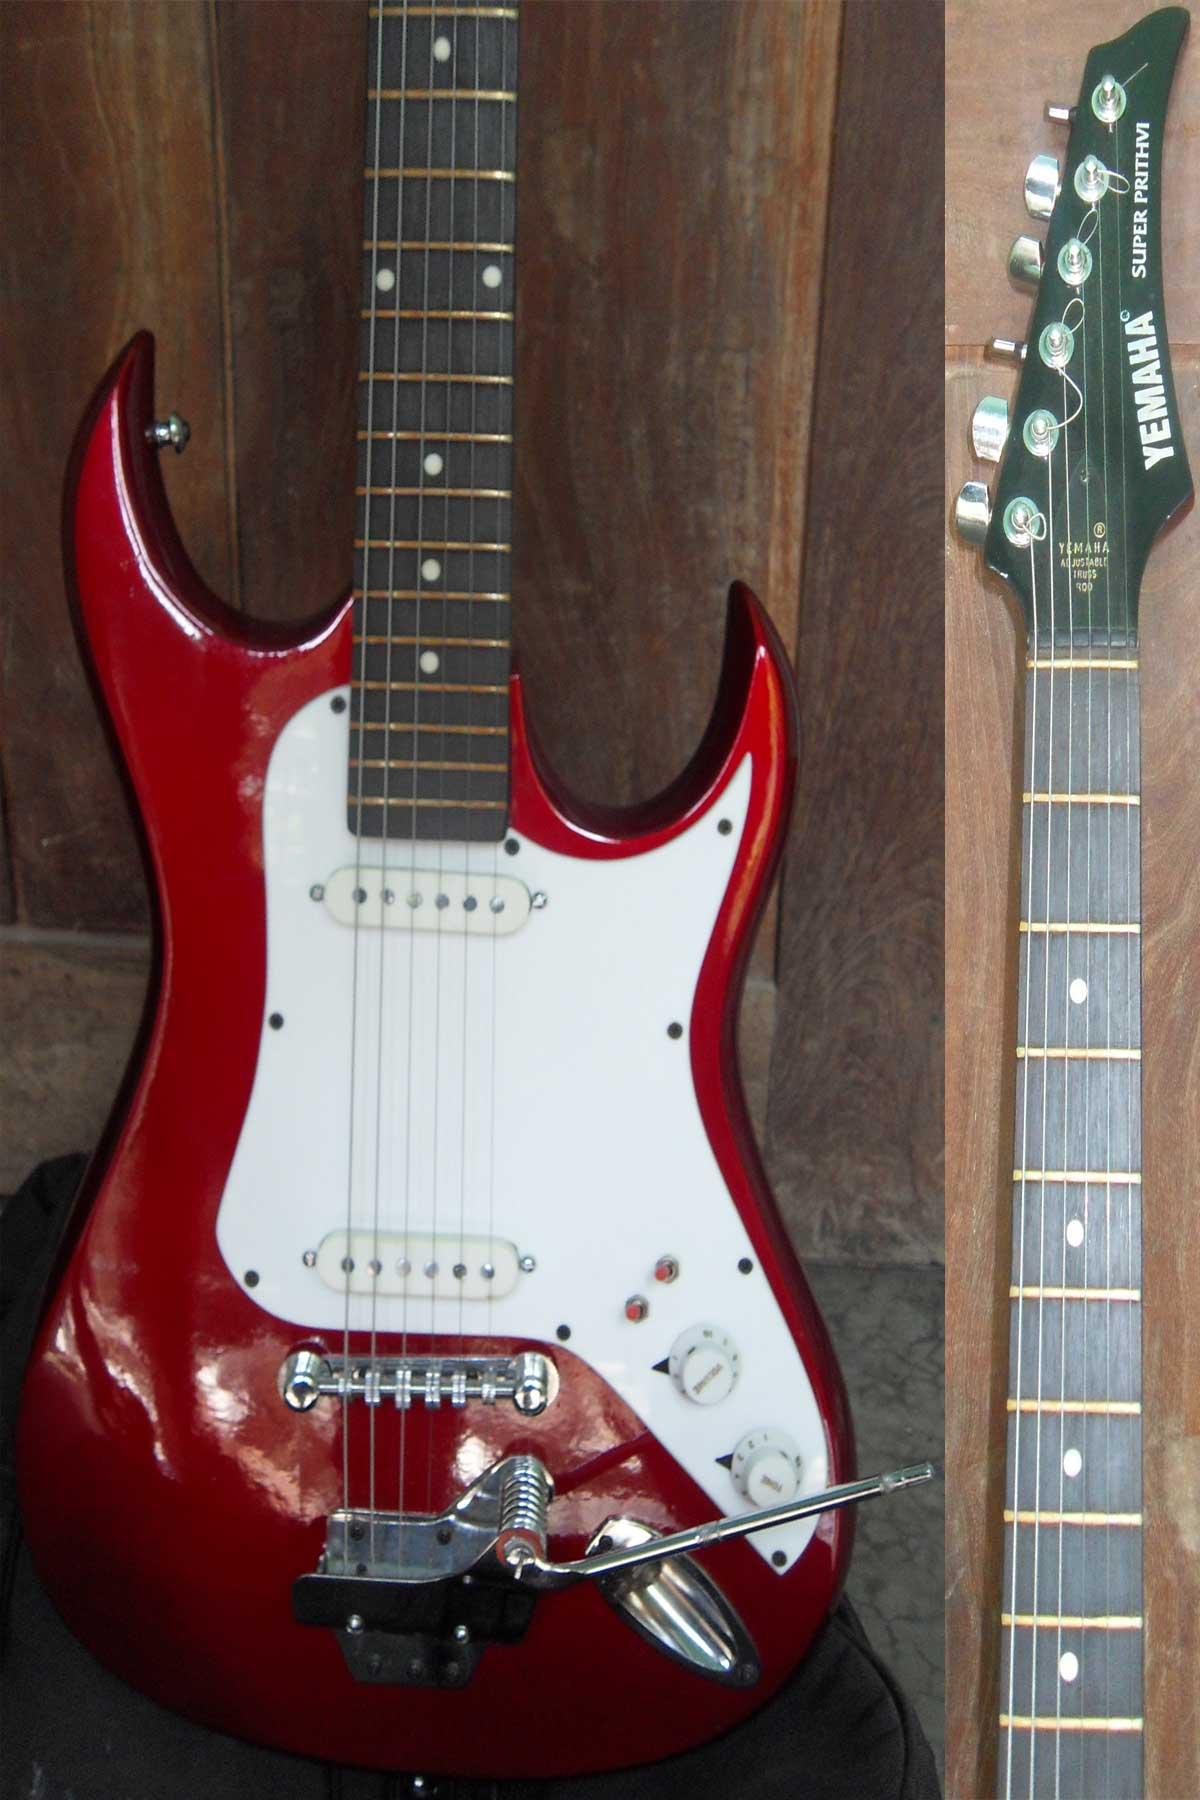 yemaha guitar urgent sell clickbd. Black Bedroom Furniture Sets. Home Design Ideas